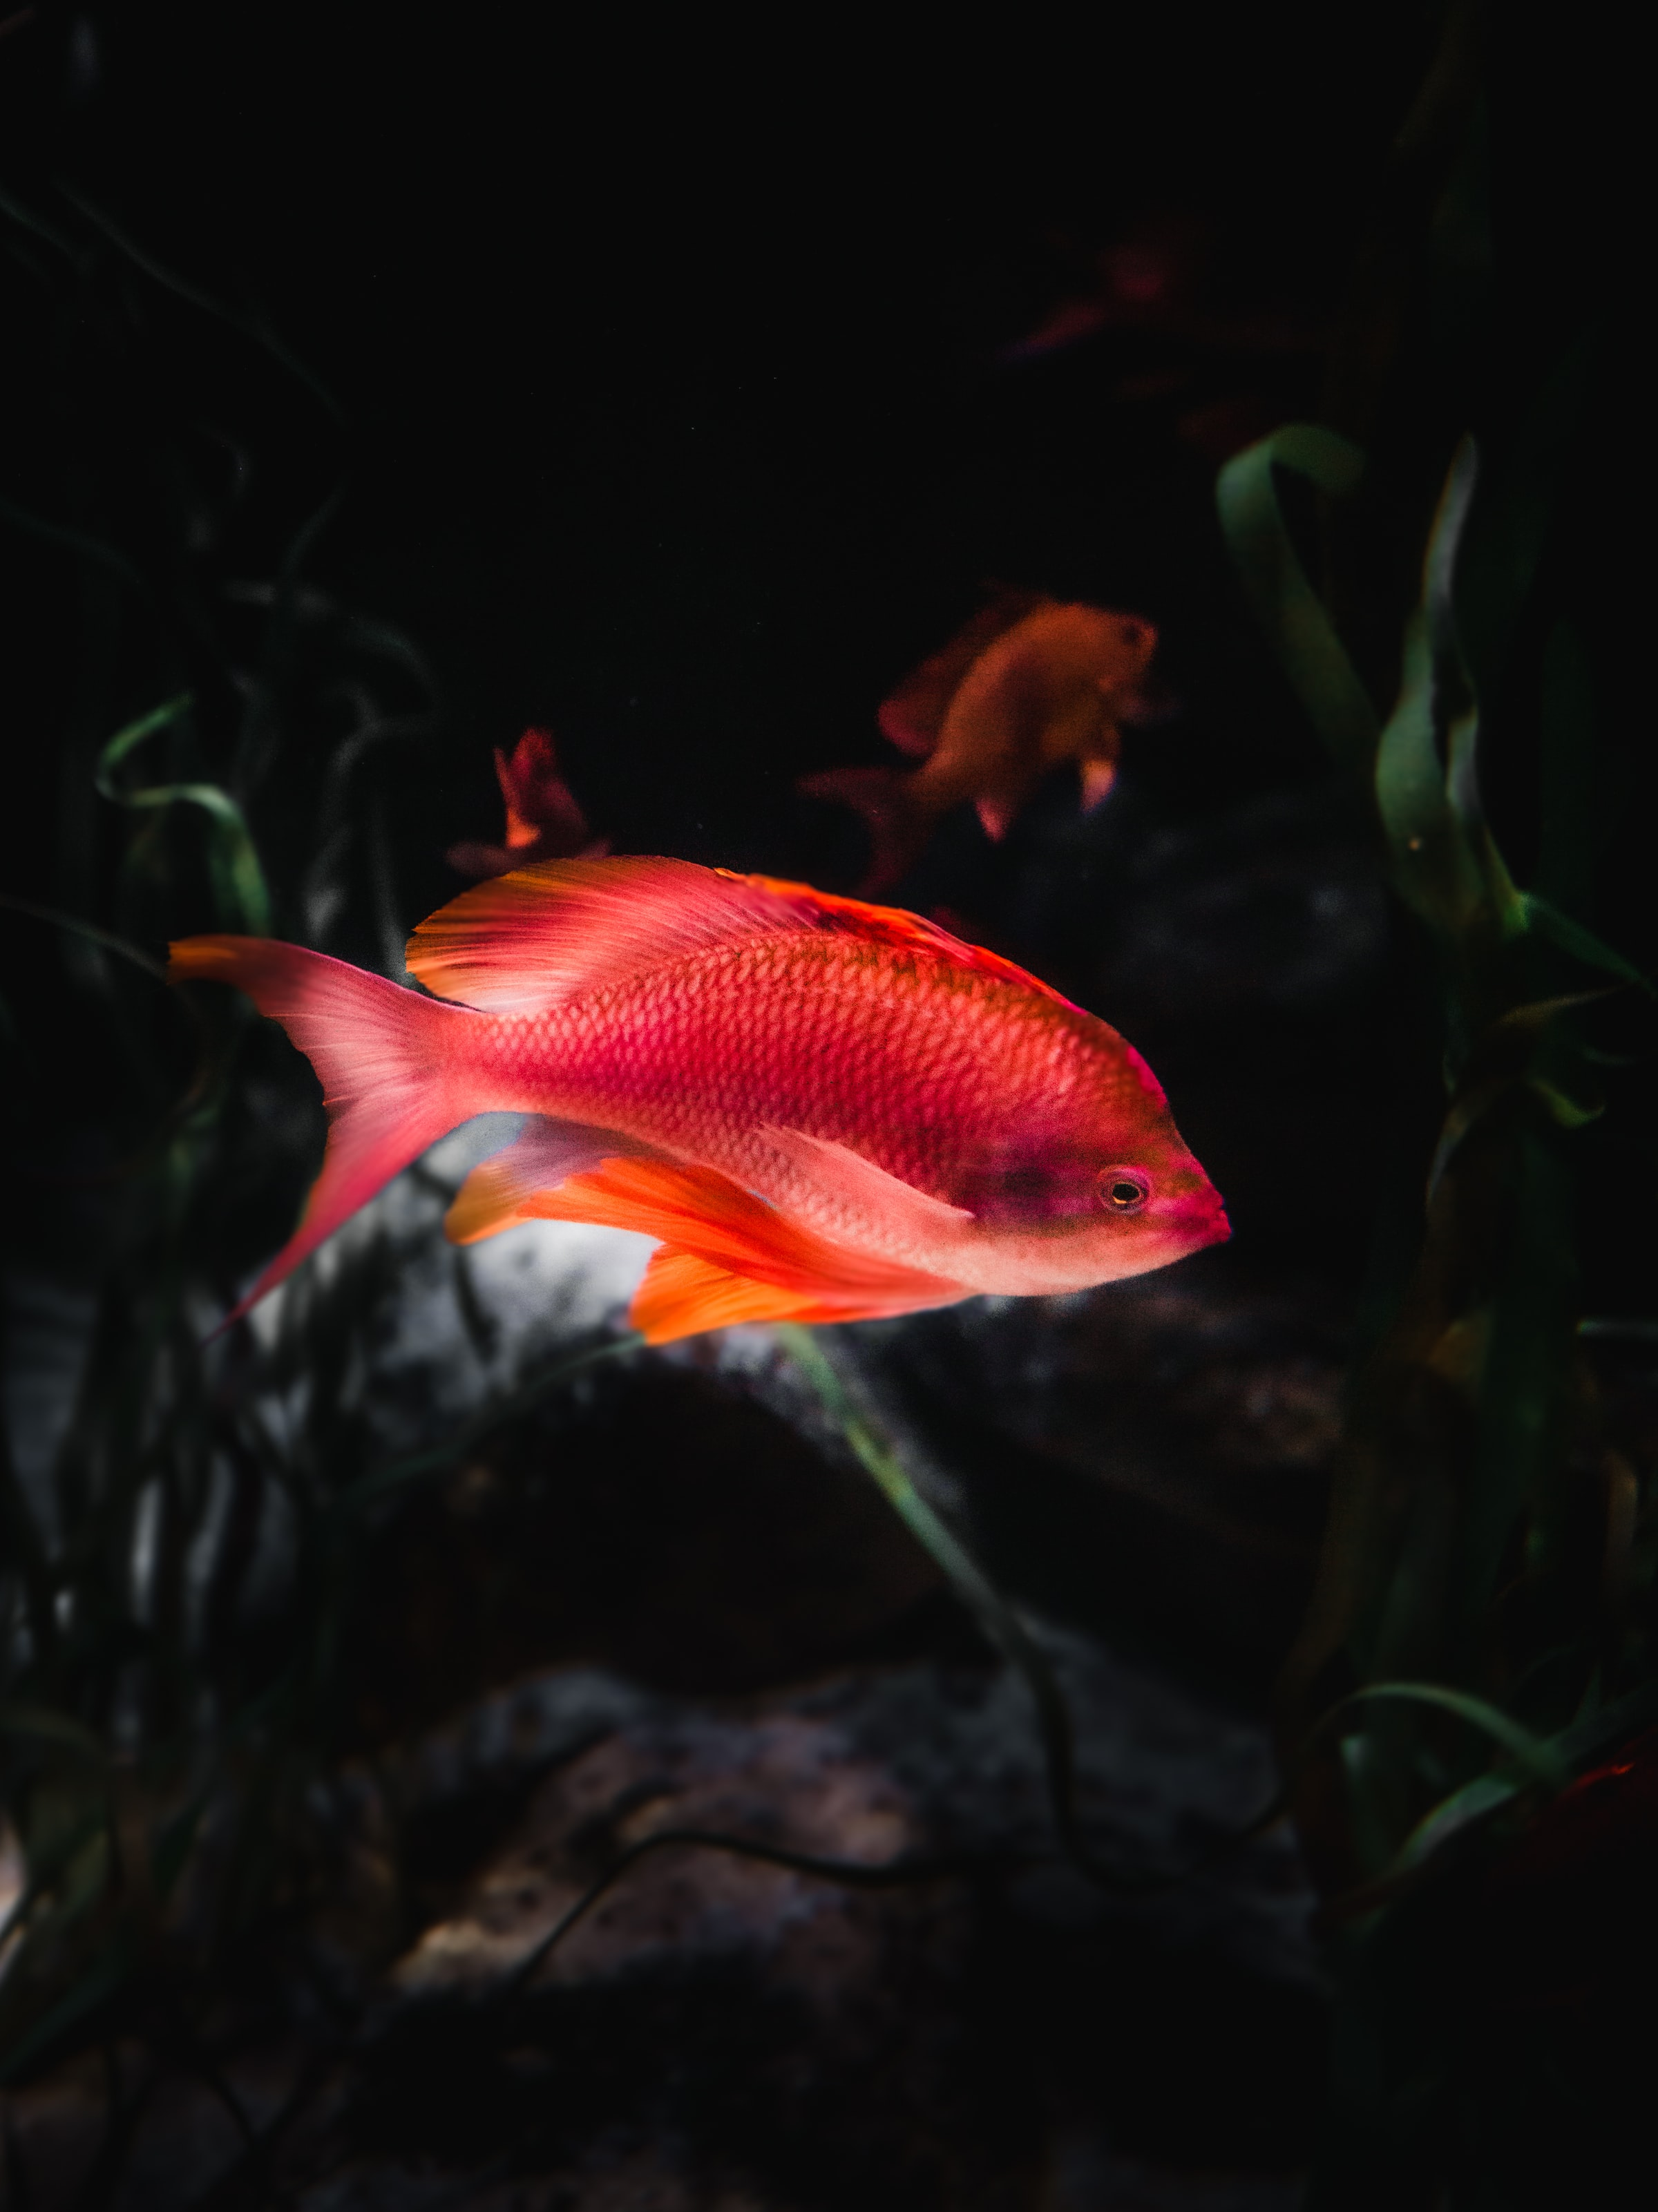 119979 Screensavers and Wallpapers Aquarium for phone. Download Animals, Water, Coral, Aquarium, Fish, Underwater, Submarine pictures for free